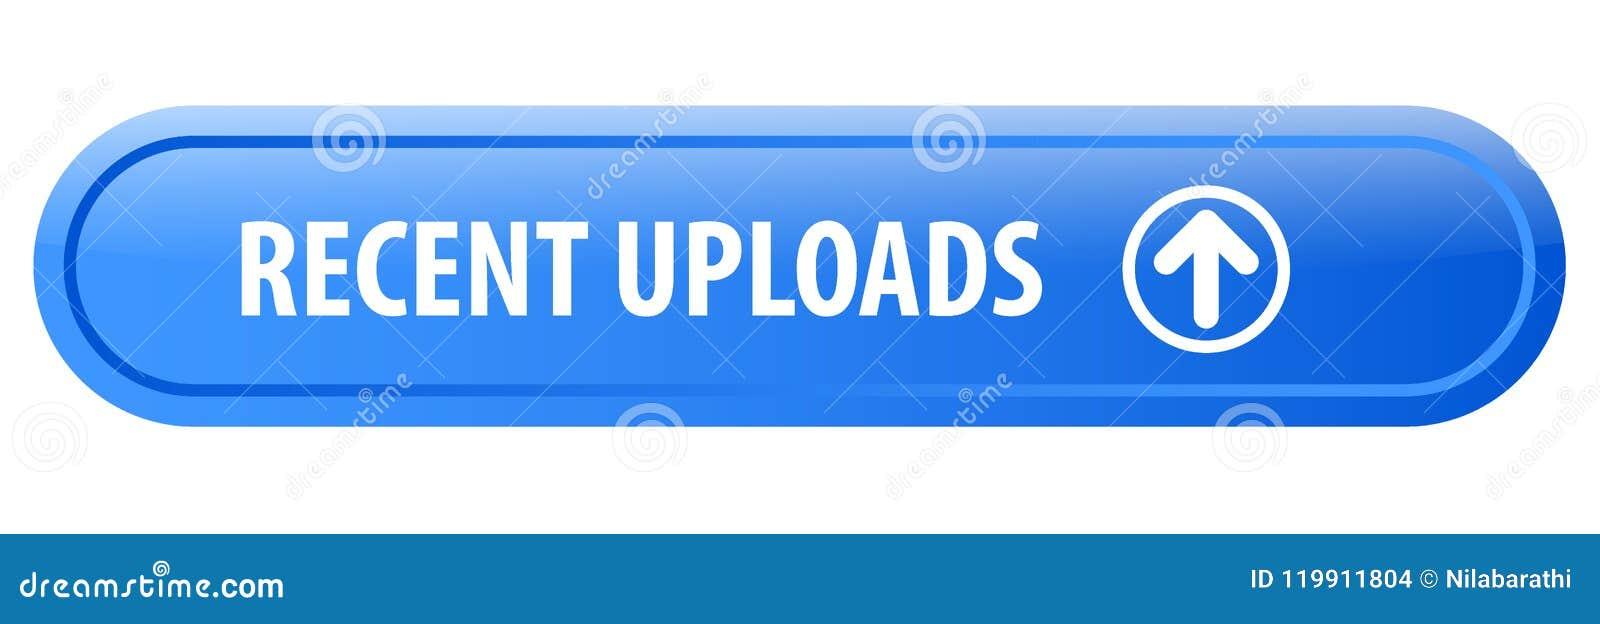 Recent uploads web button